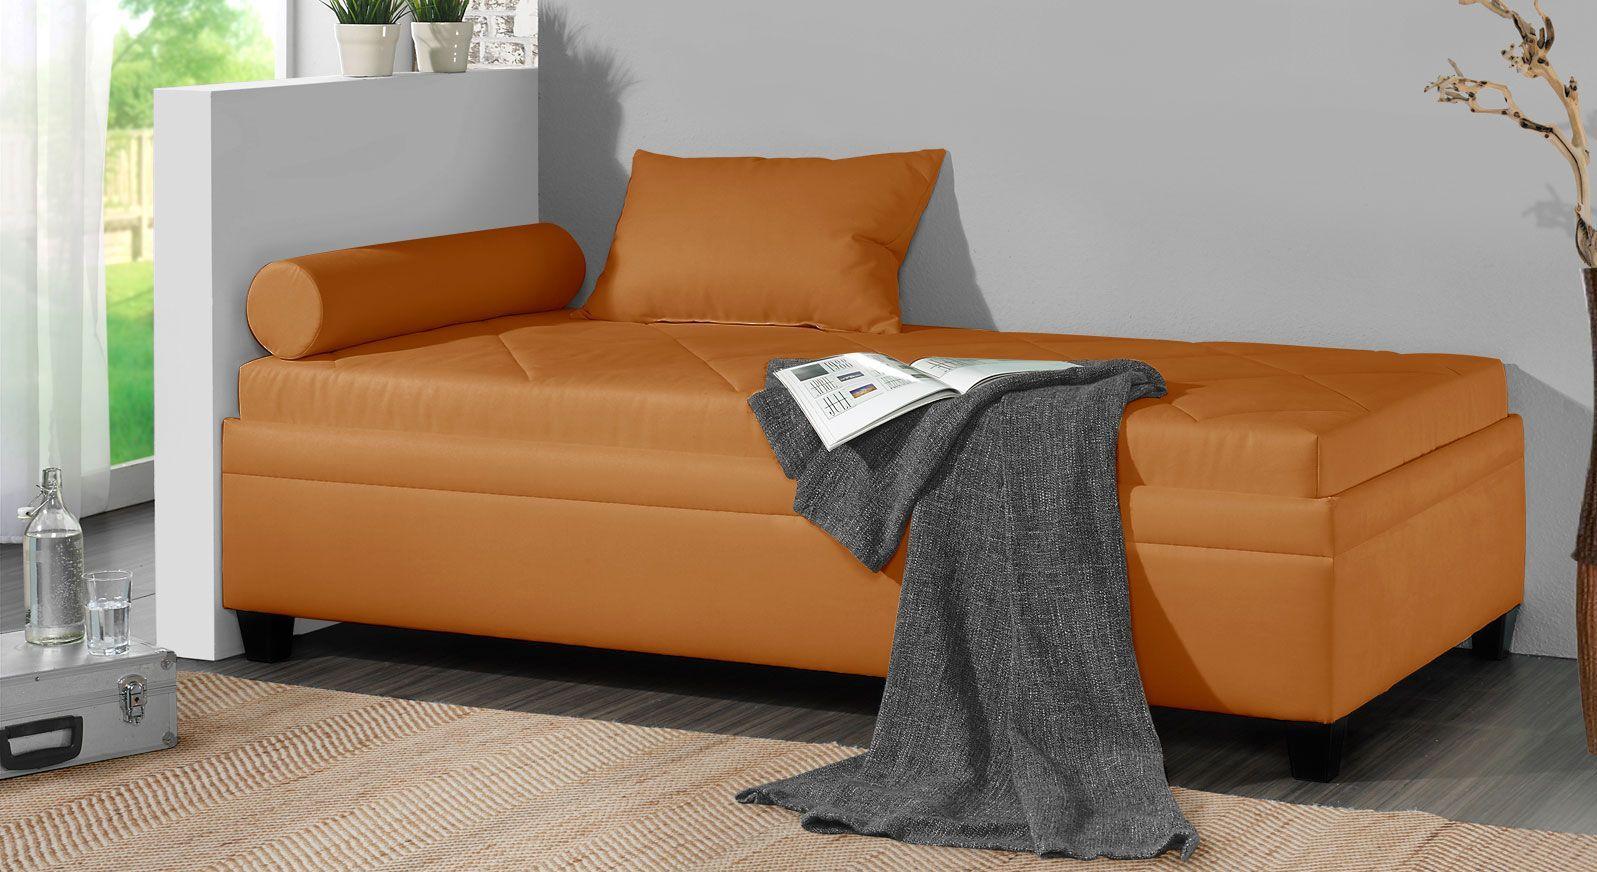 Relaxliege Kamina aus Microvelours in Orange